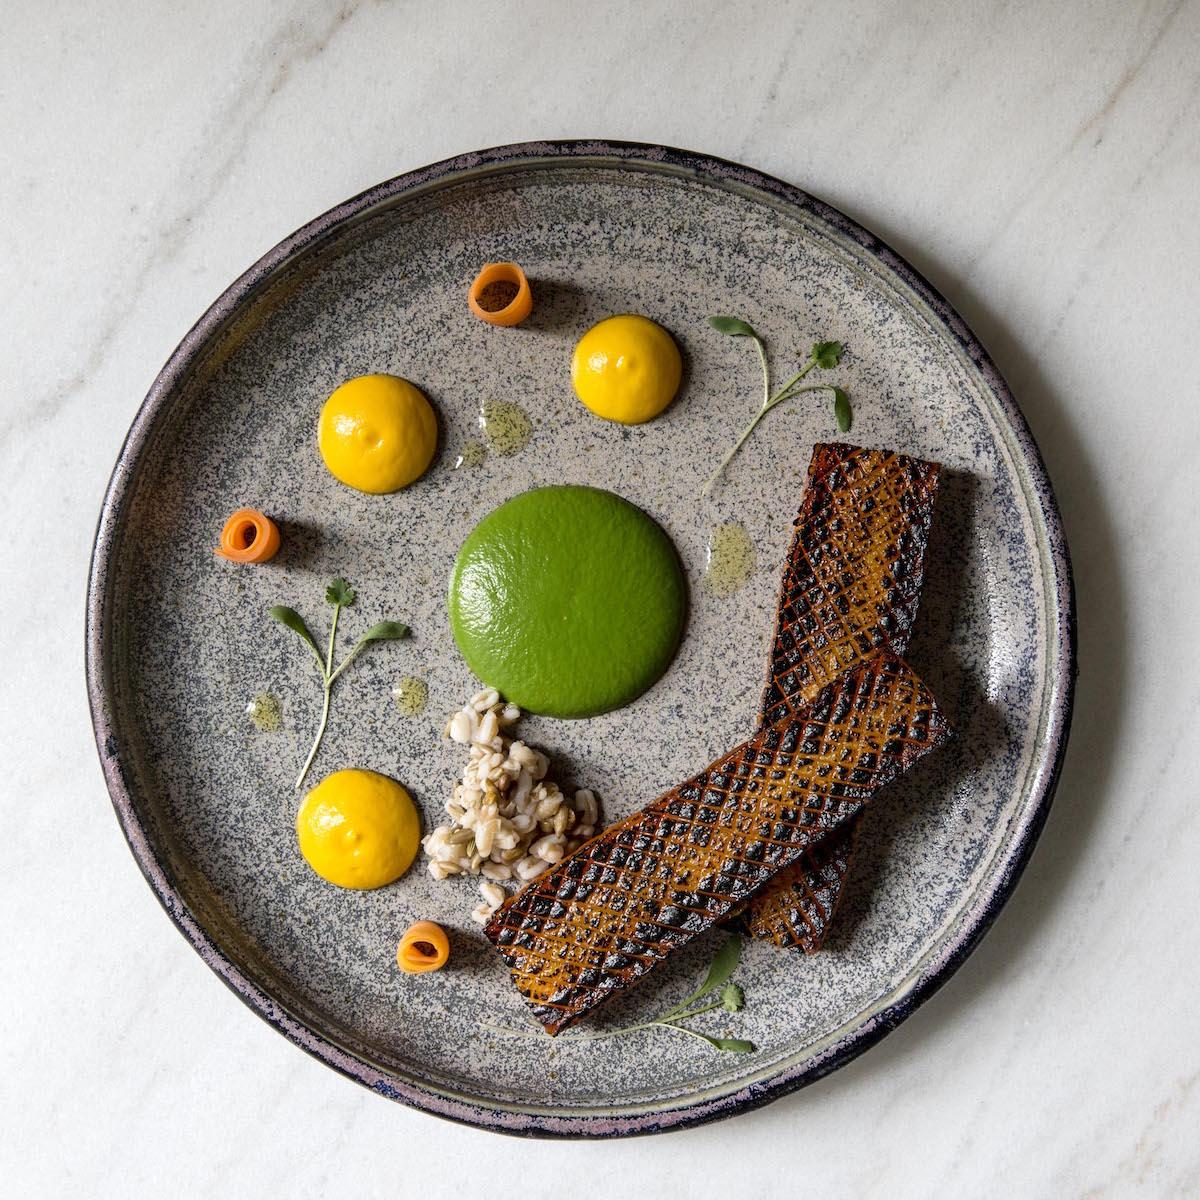 acorn vegetarian restaurant bath vegan plant based food british restaurants